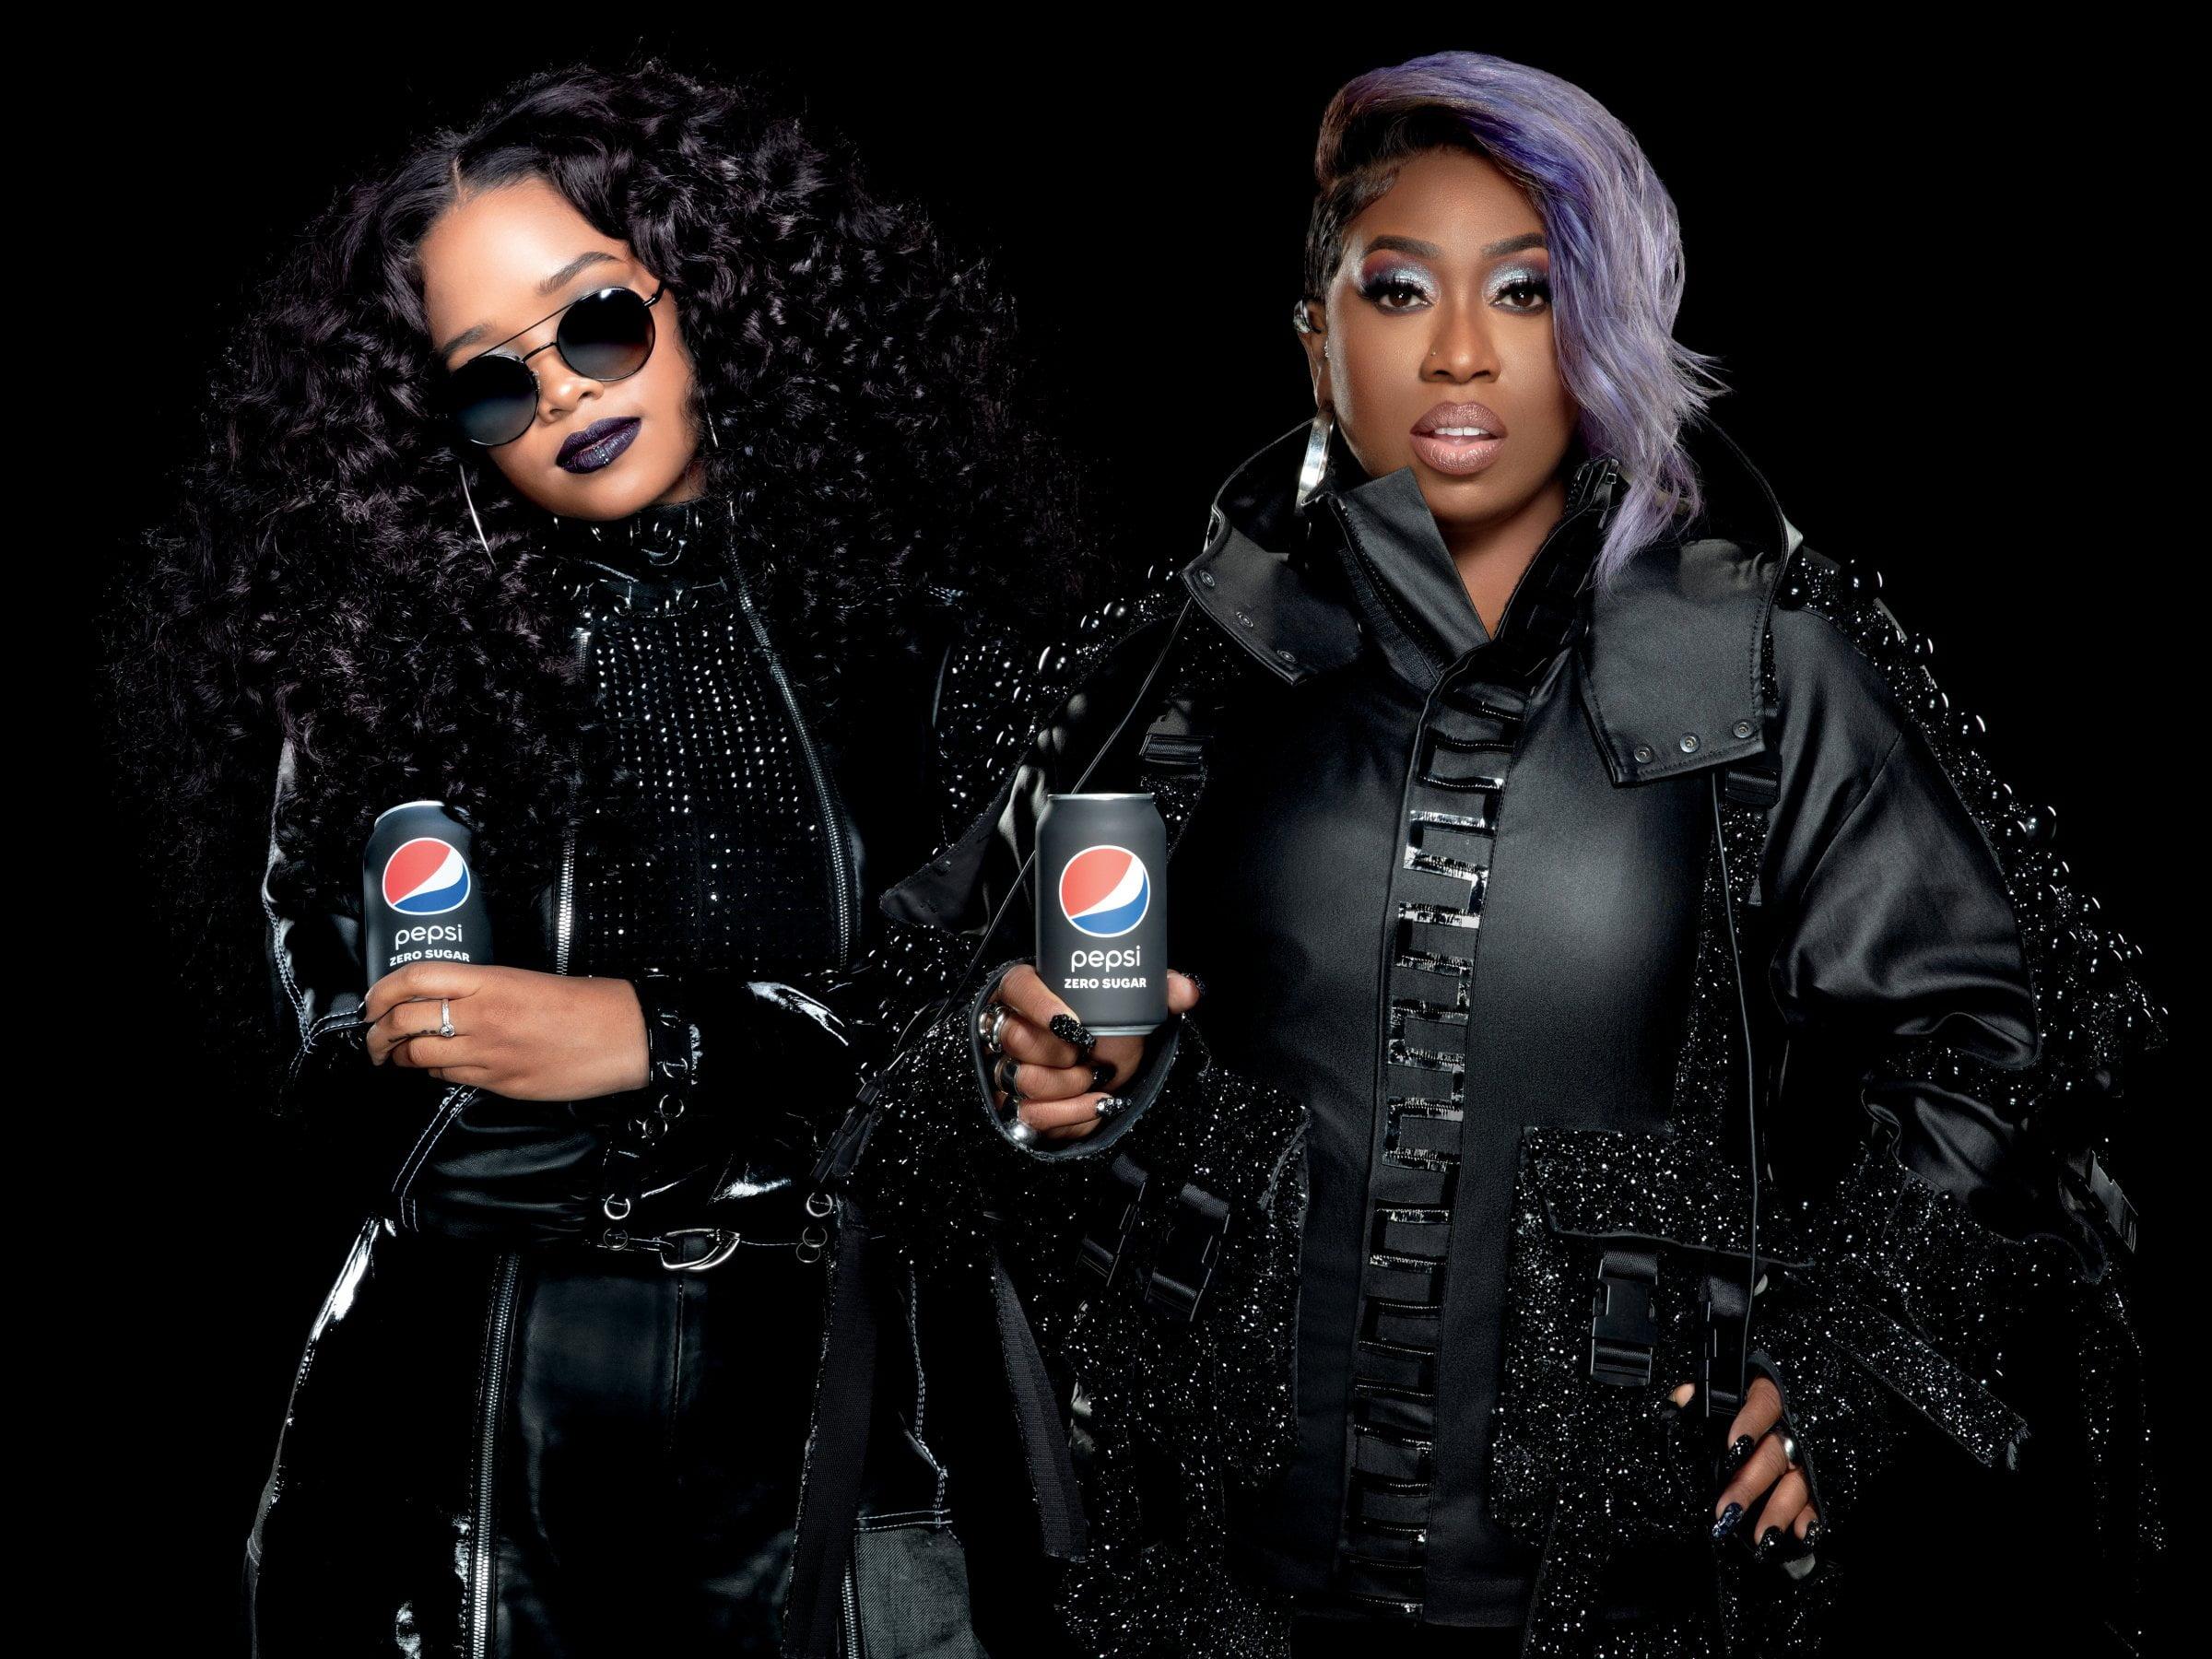 Missy Elliott X H.E.R. Pepsi Zero Sugar